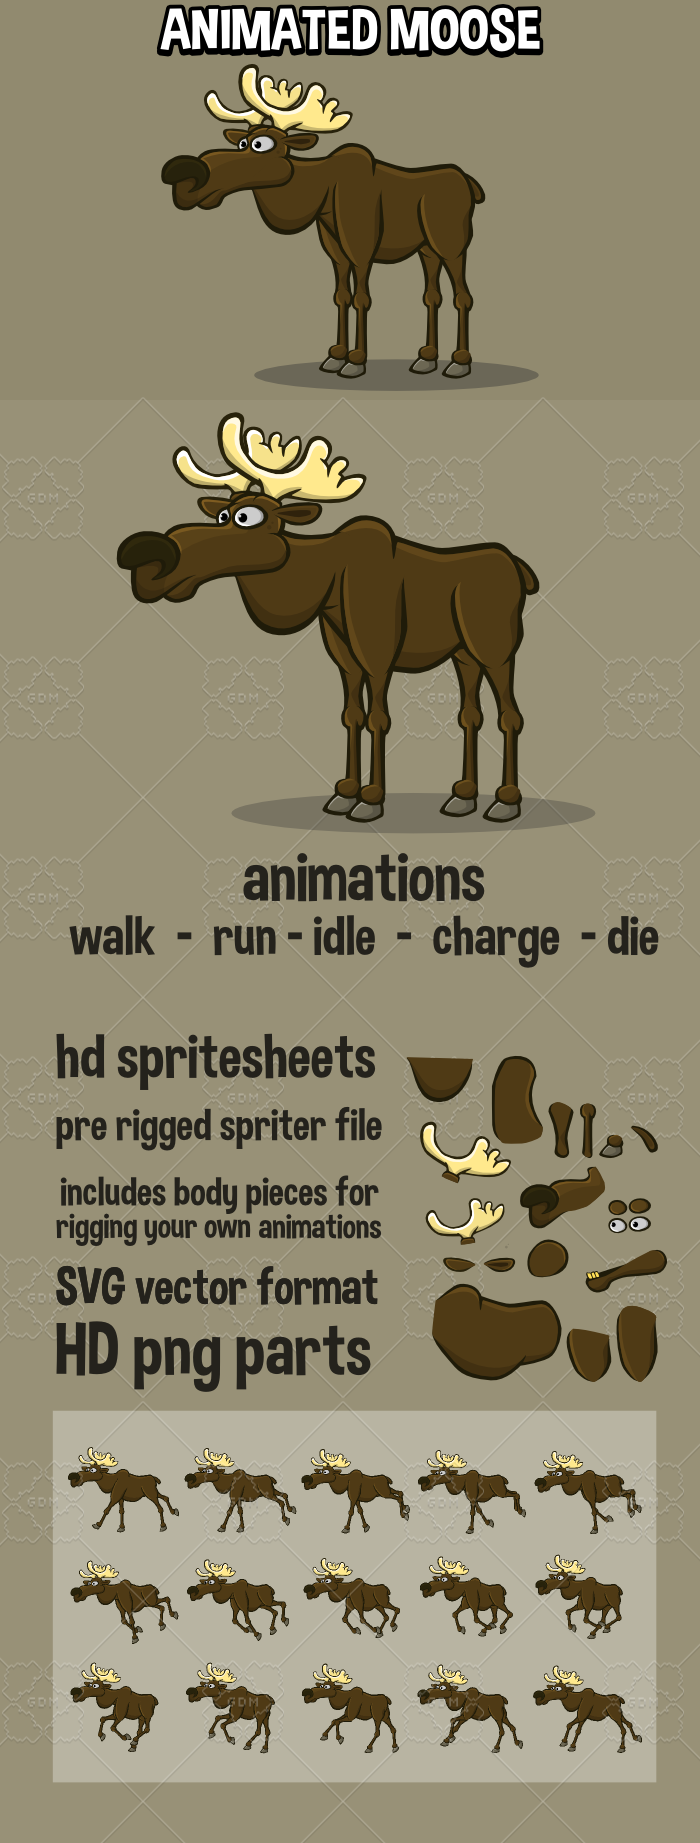 Animated moose